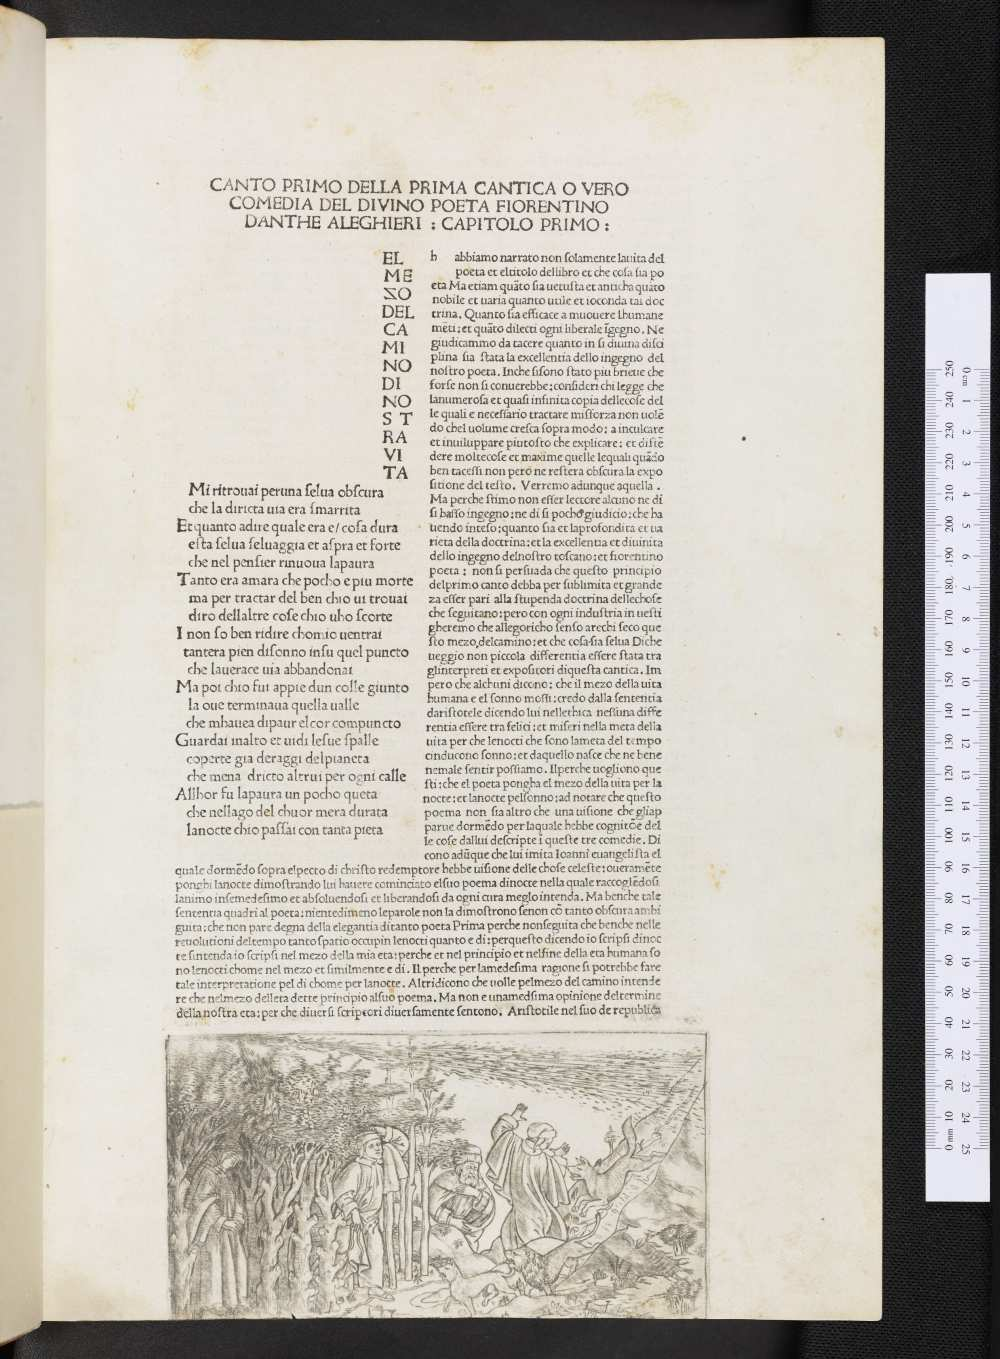 Bodleian Library Auct. 2Q 1.11. A kép forrása: Bodleian Libraries, University of Oxford https://digital.bodleian.ox.ac.uk/objects/1ba80701-8b5b-4fc9-9252-b6101c99e791/surfaces/687ddea1-ae80-46e1-a89d-72f897b7fb84/